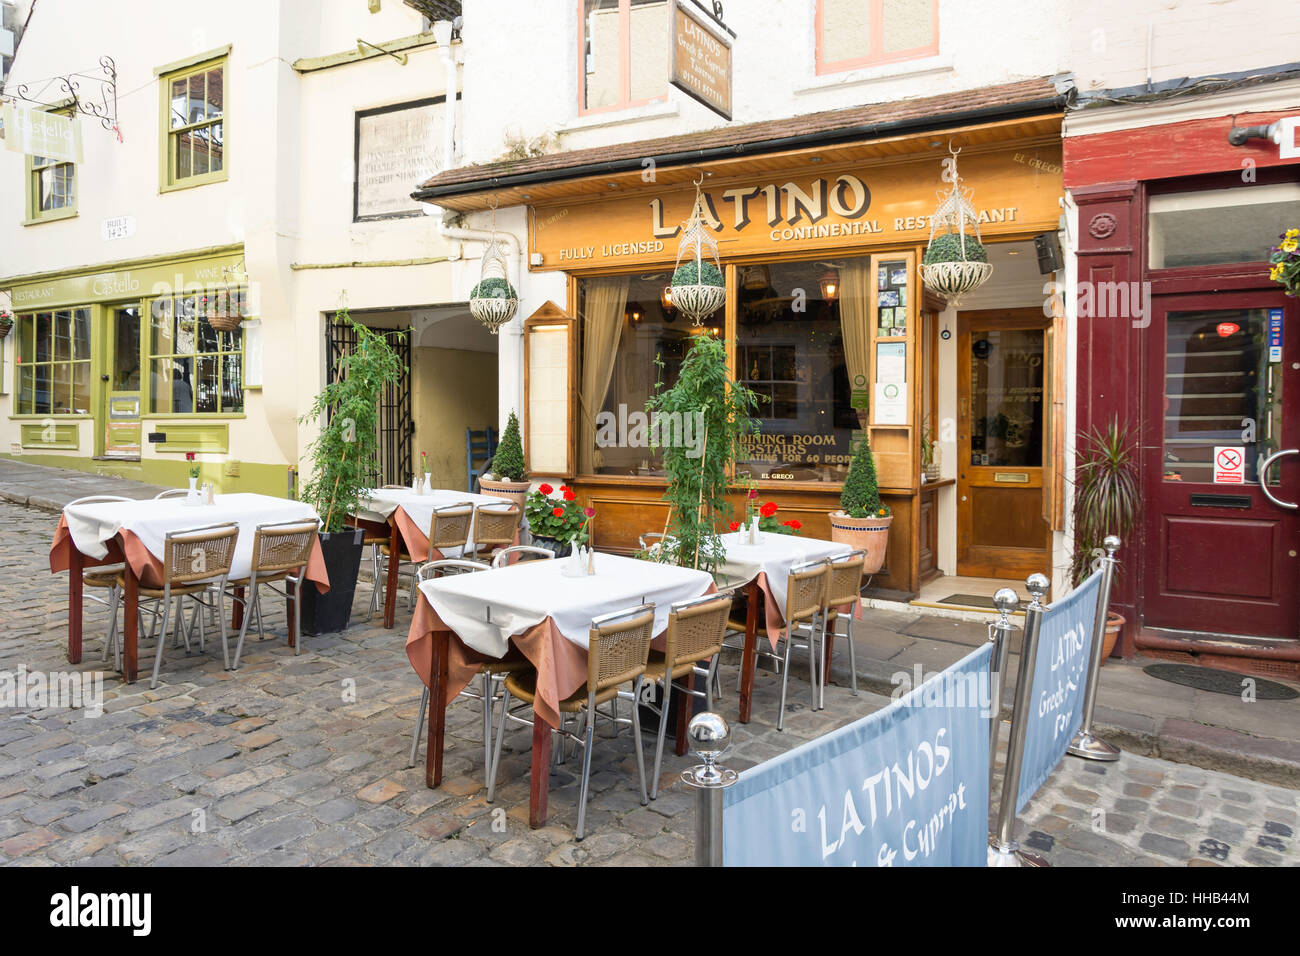 Outdoor seating at Latino Greek Restaurant, Church Lane, Windsor, Berkshire, England, United Kingdom - Stock Image